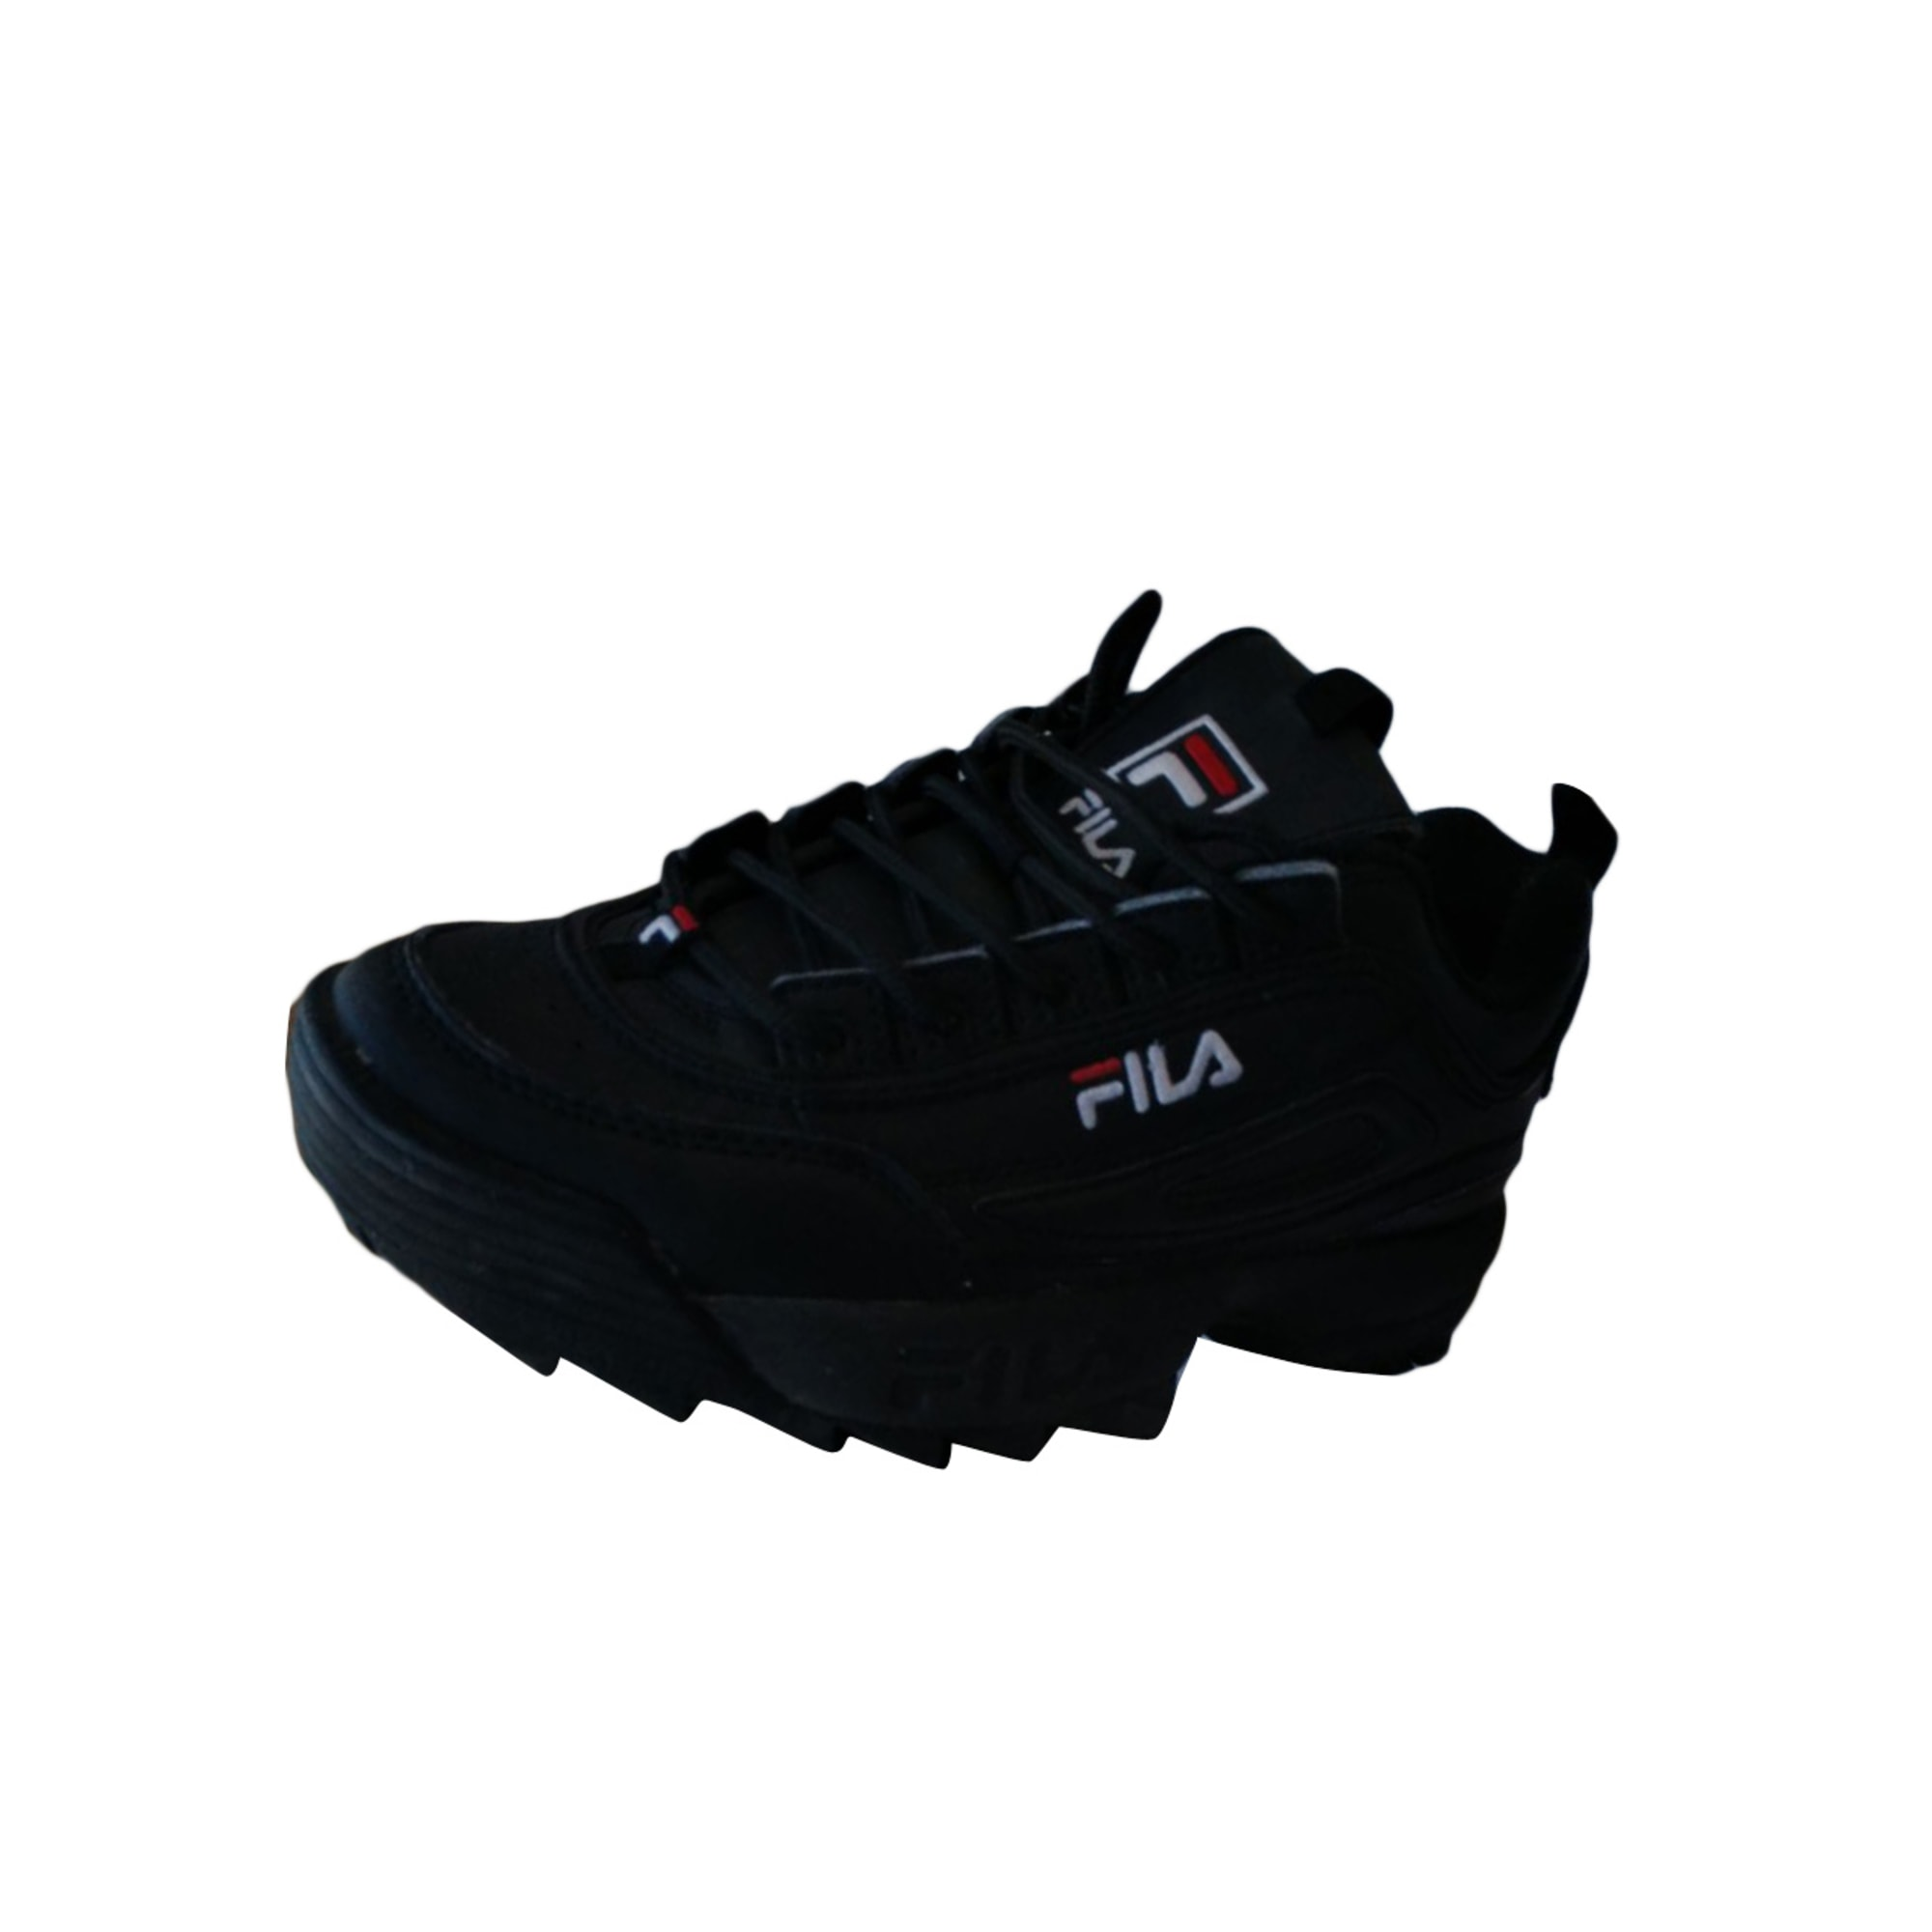 Chaussures Fila Homme neuf : articles tendance Videdressing